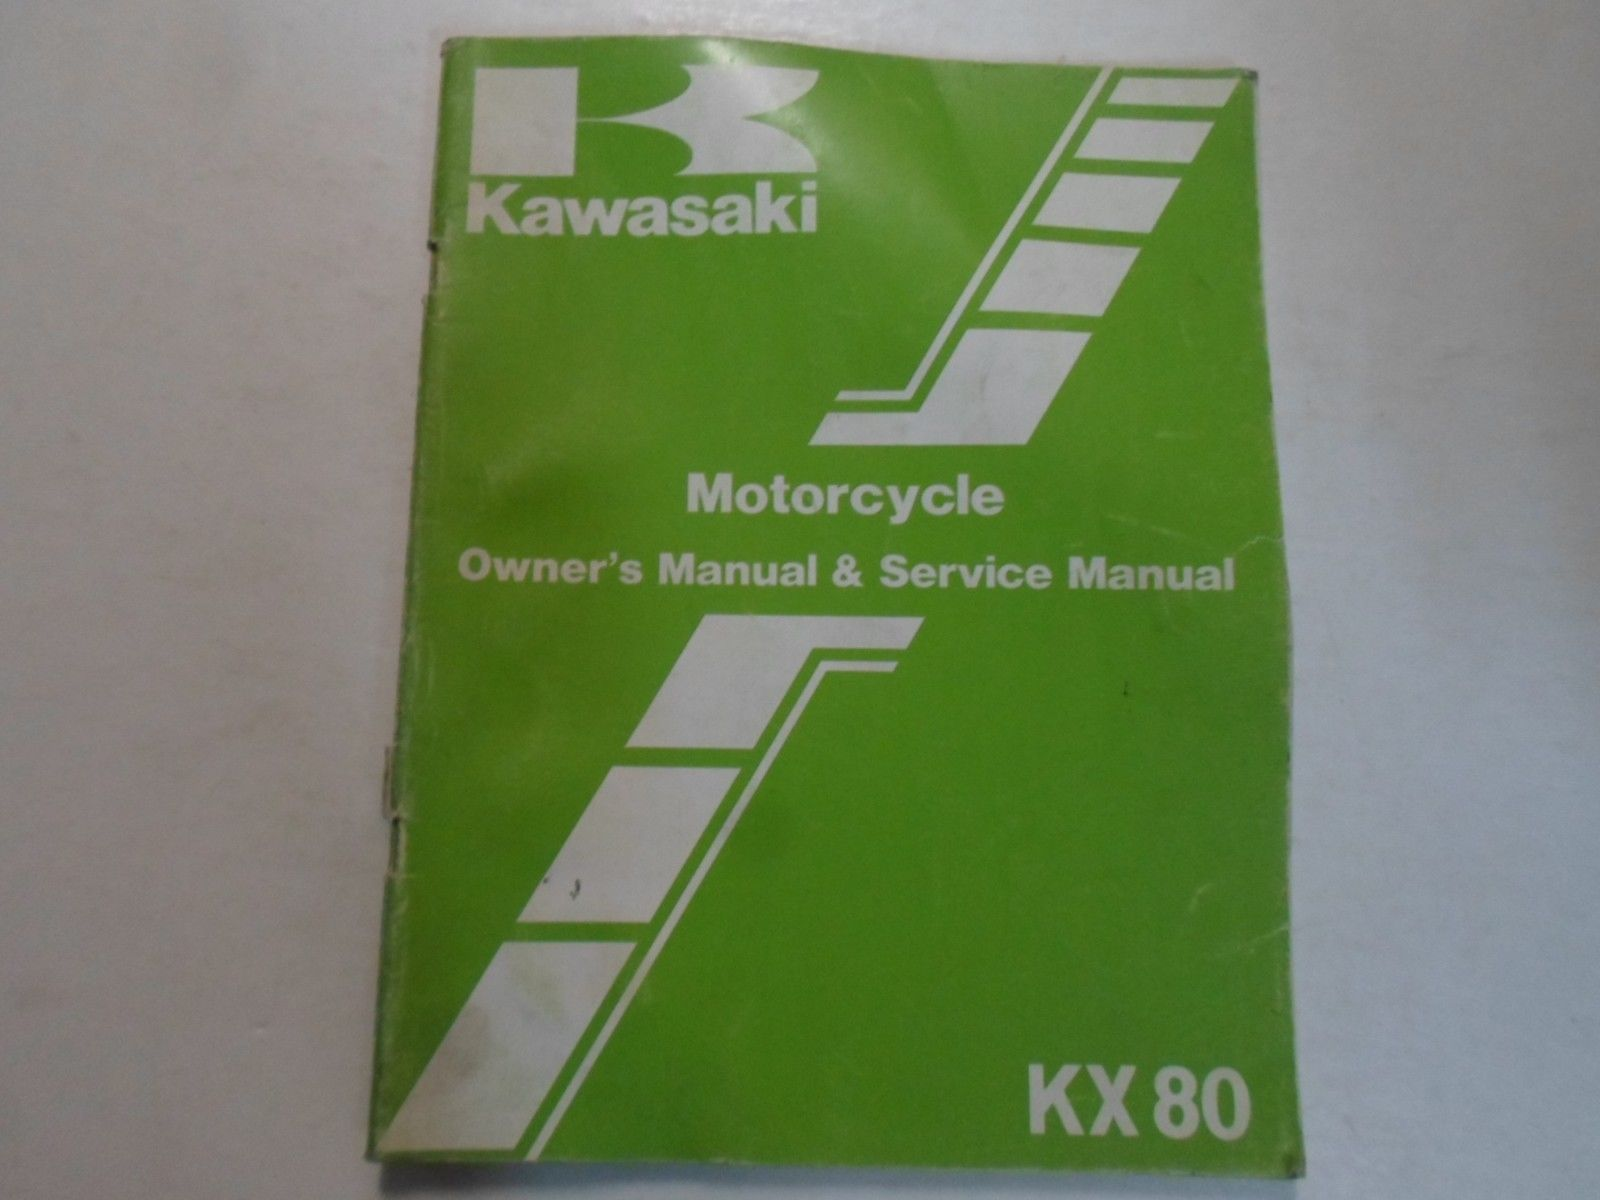 1984 Kawasaki KX80 Owners Manual & Service Manual DAMAGED WORN FACTORY OEM  DEAL